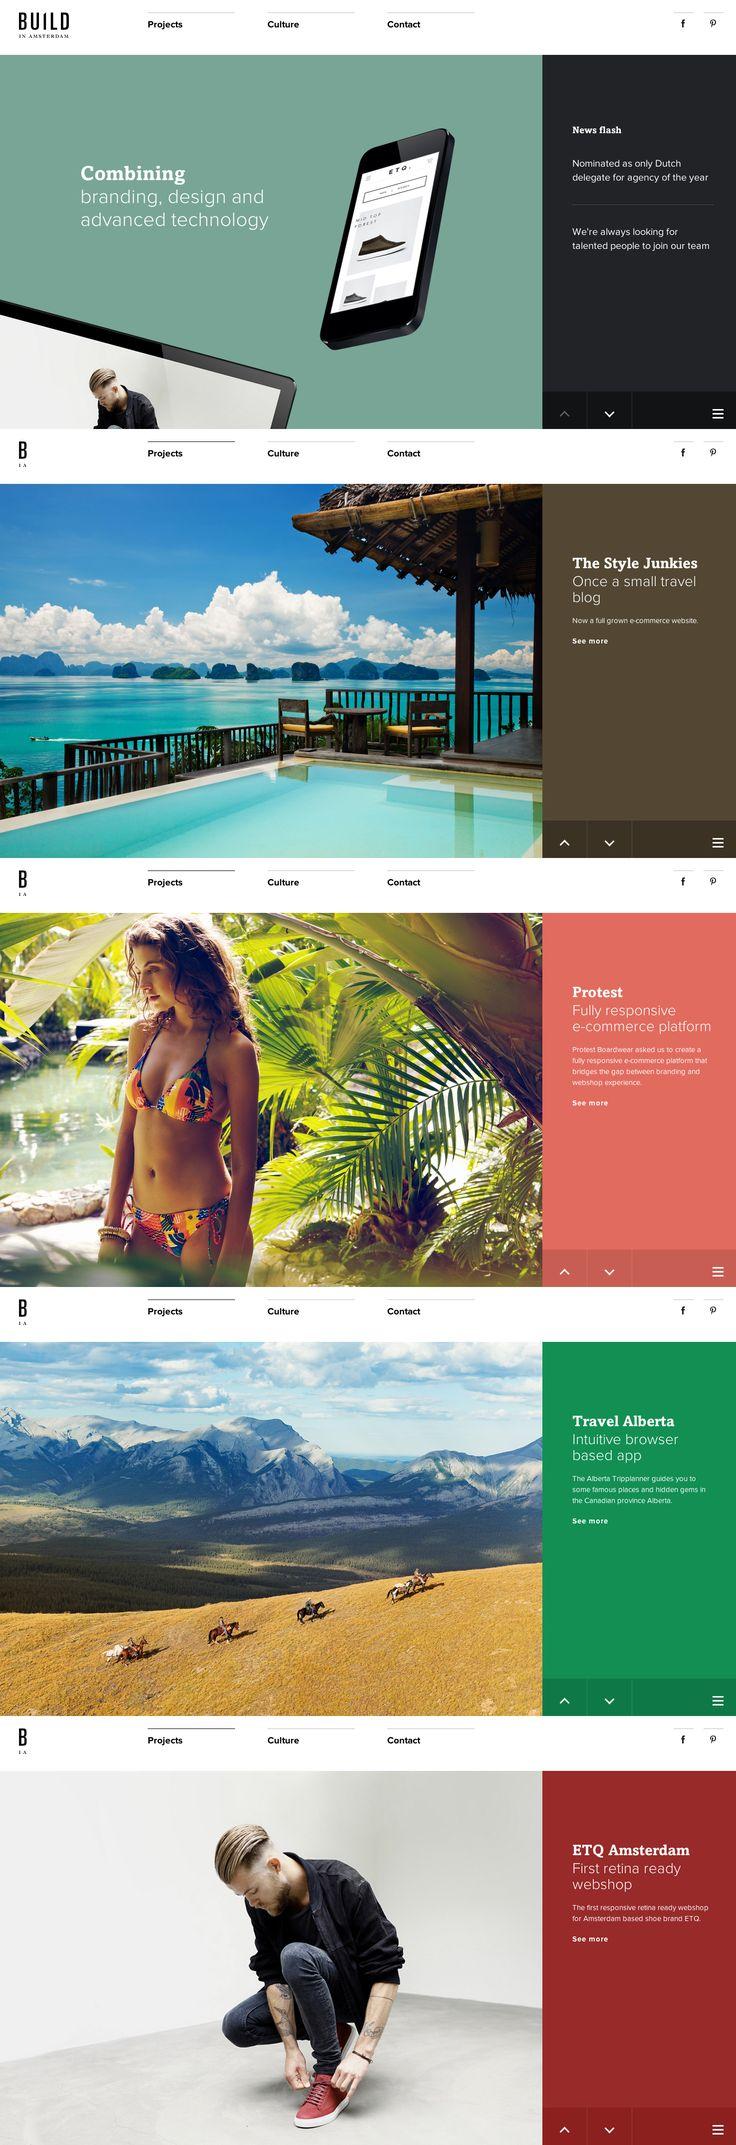 Cool Web Design, BUILD IN AMSTERDAM. #webdesign #webdevelopment [http://www.pinterest.com/alfredchong/]